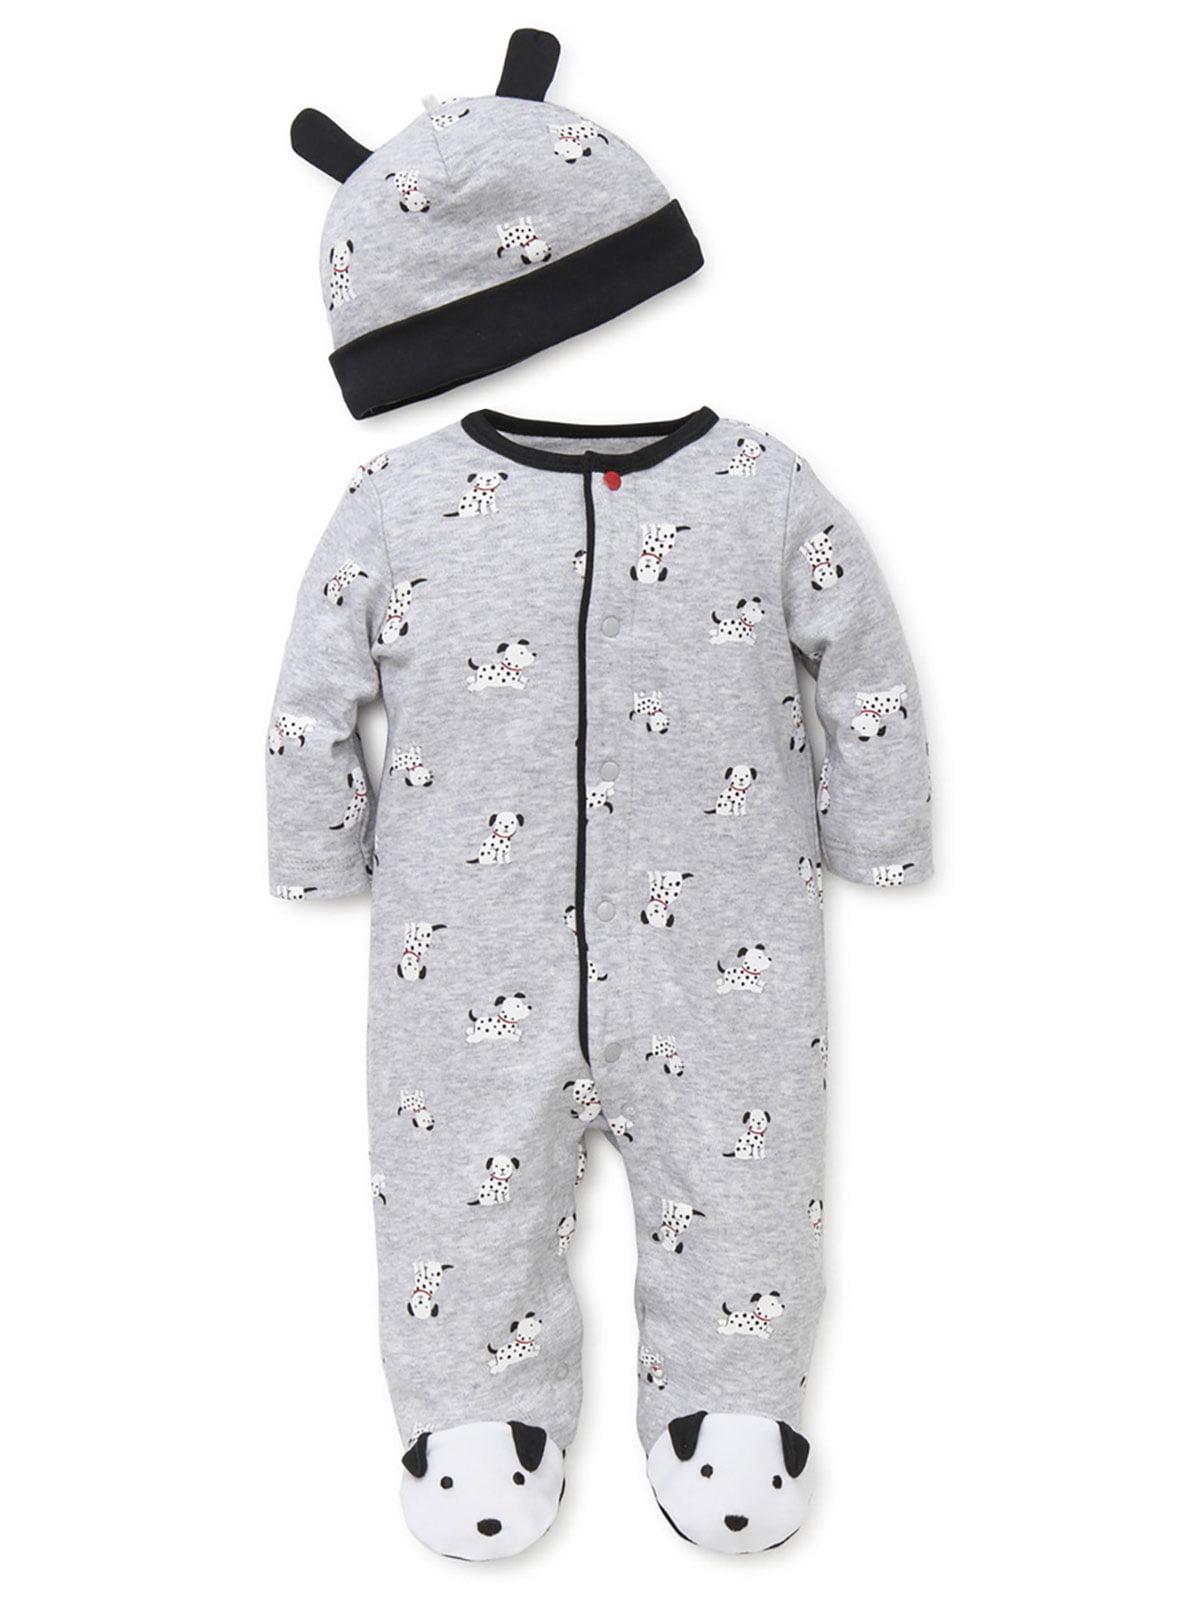 Paw Patrol Dalmatian Firefighter Dog Toddler Pajama Sleeper